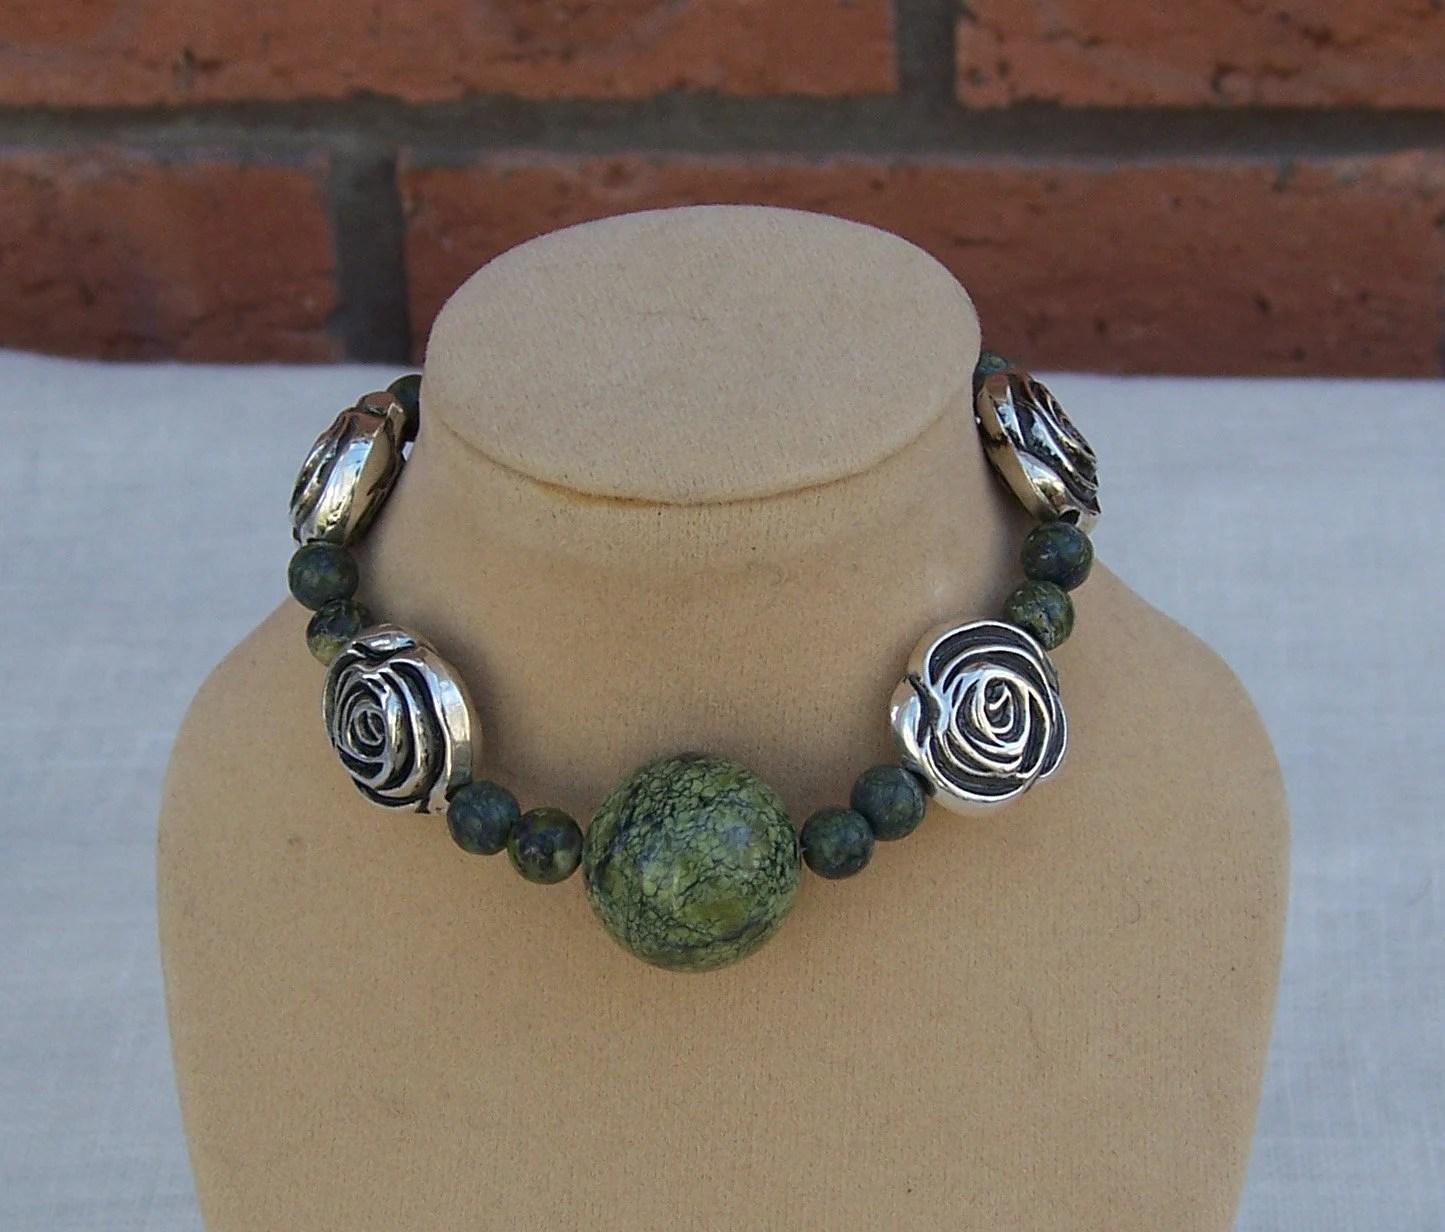 Serpentine Charm Bracelet